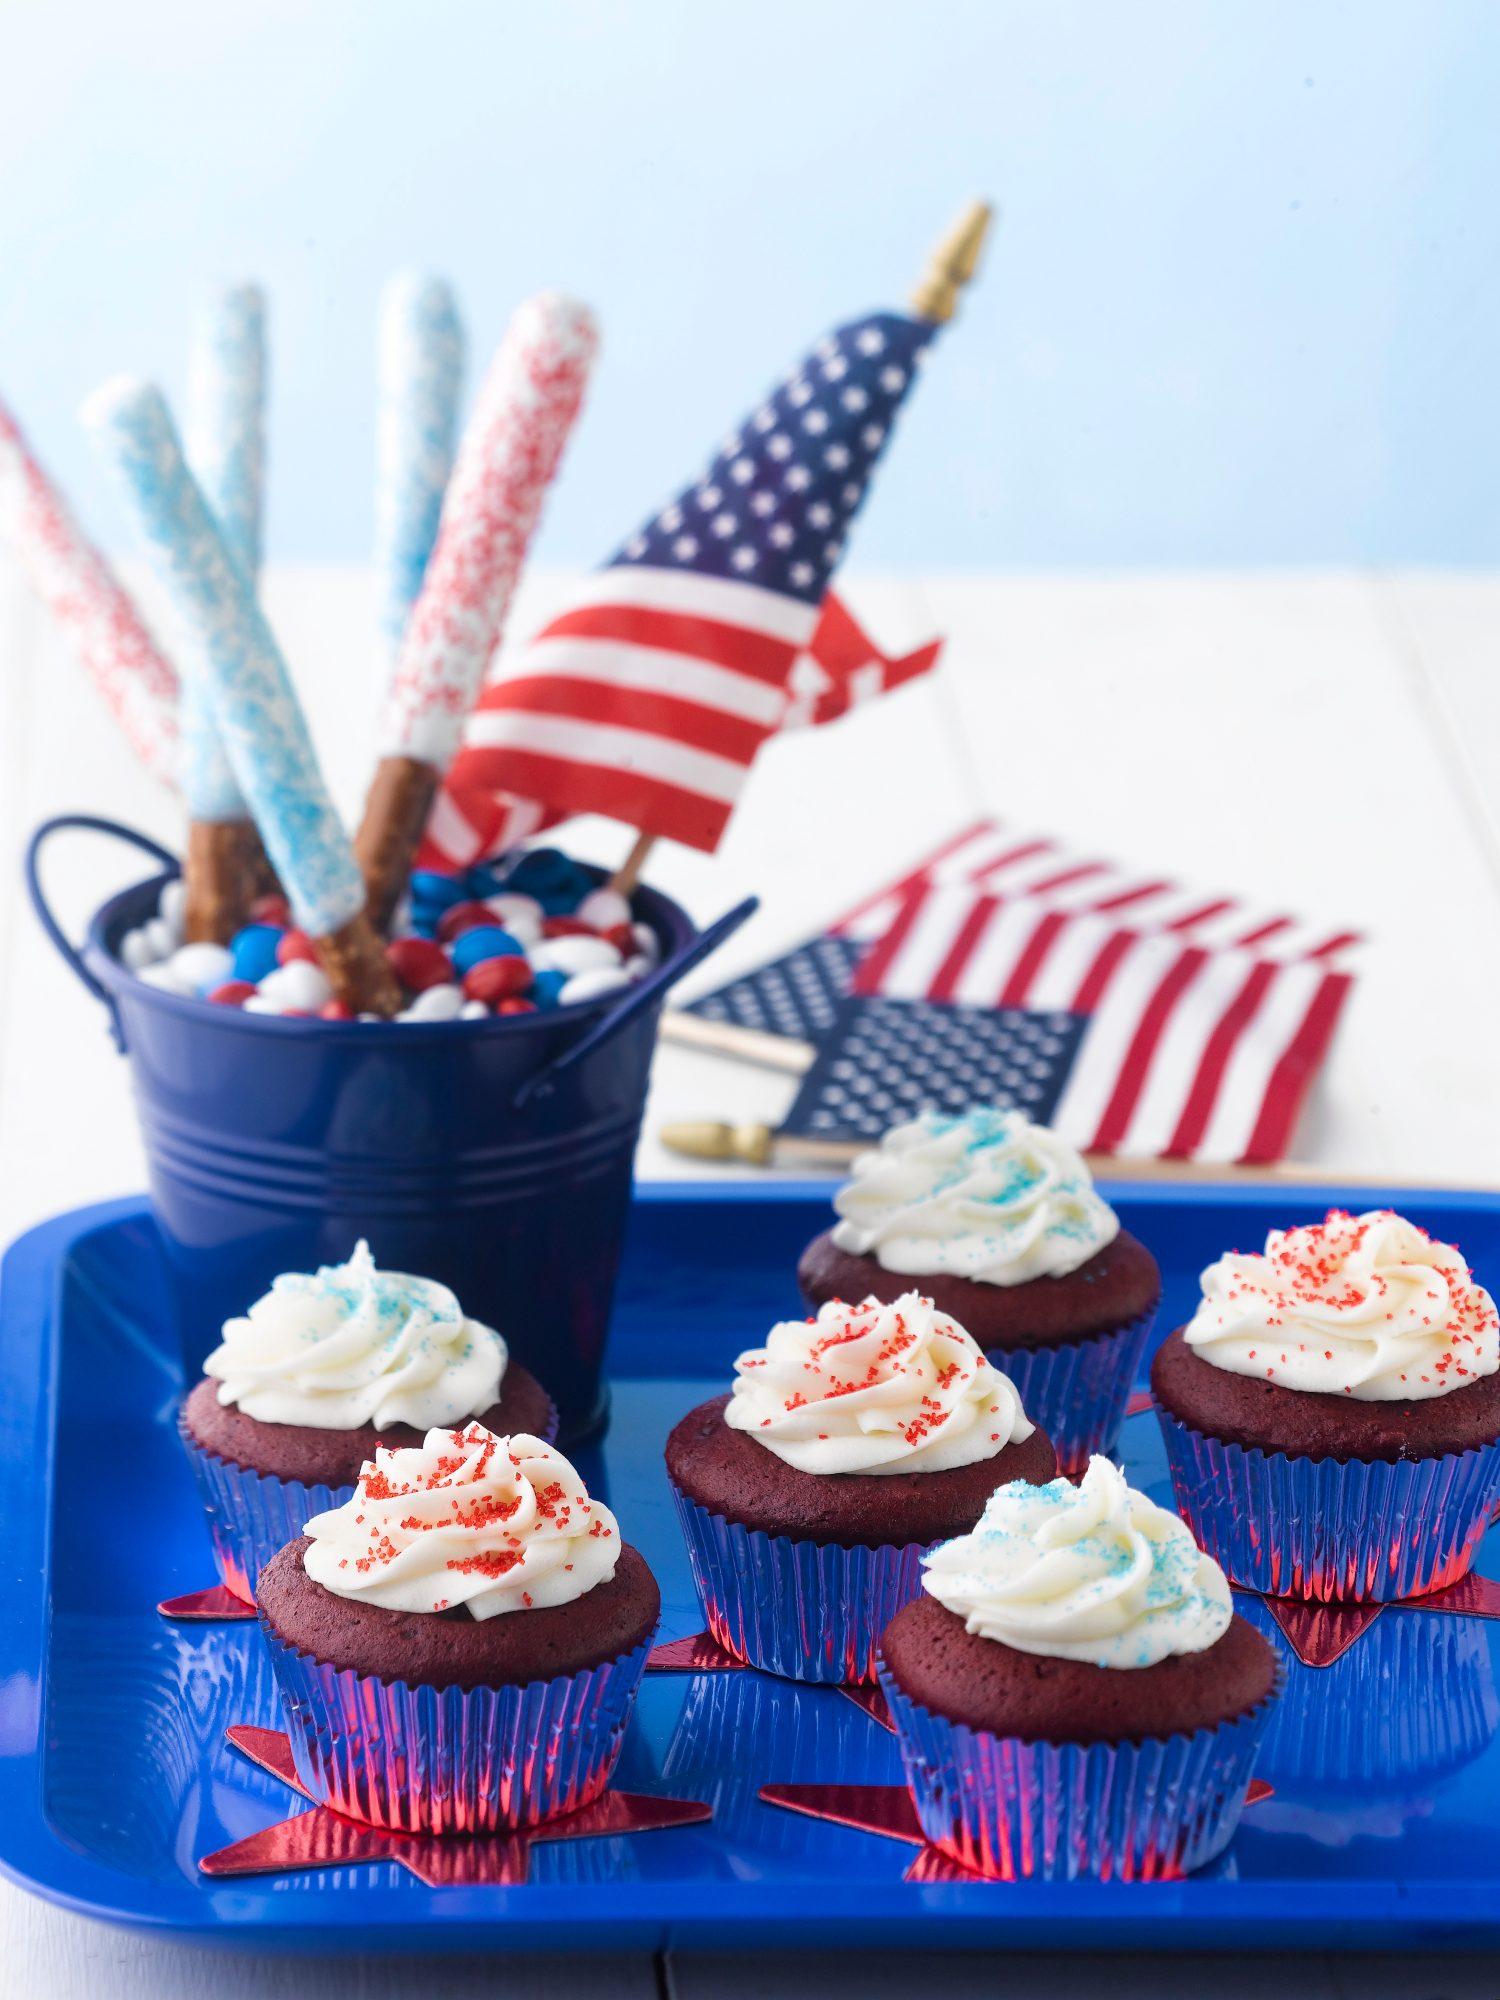 Pretzel Sparklers and Firecracker Coconut Cupcakes